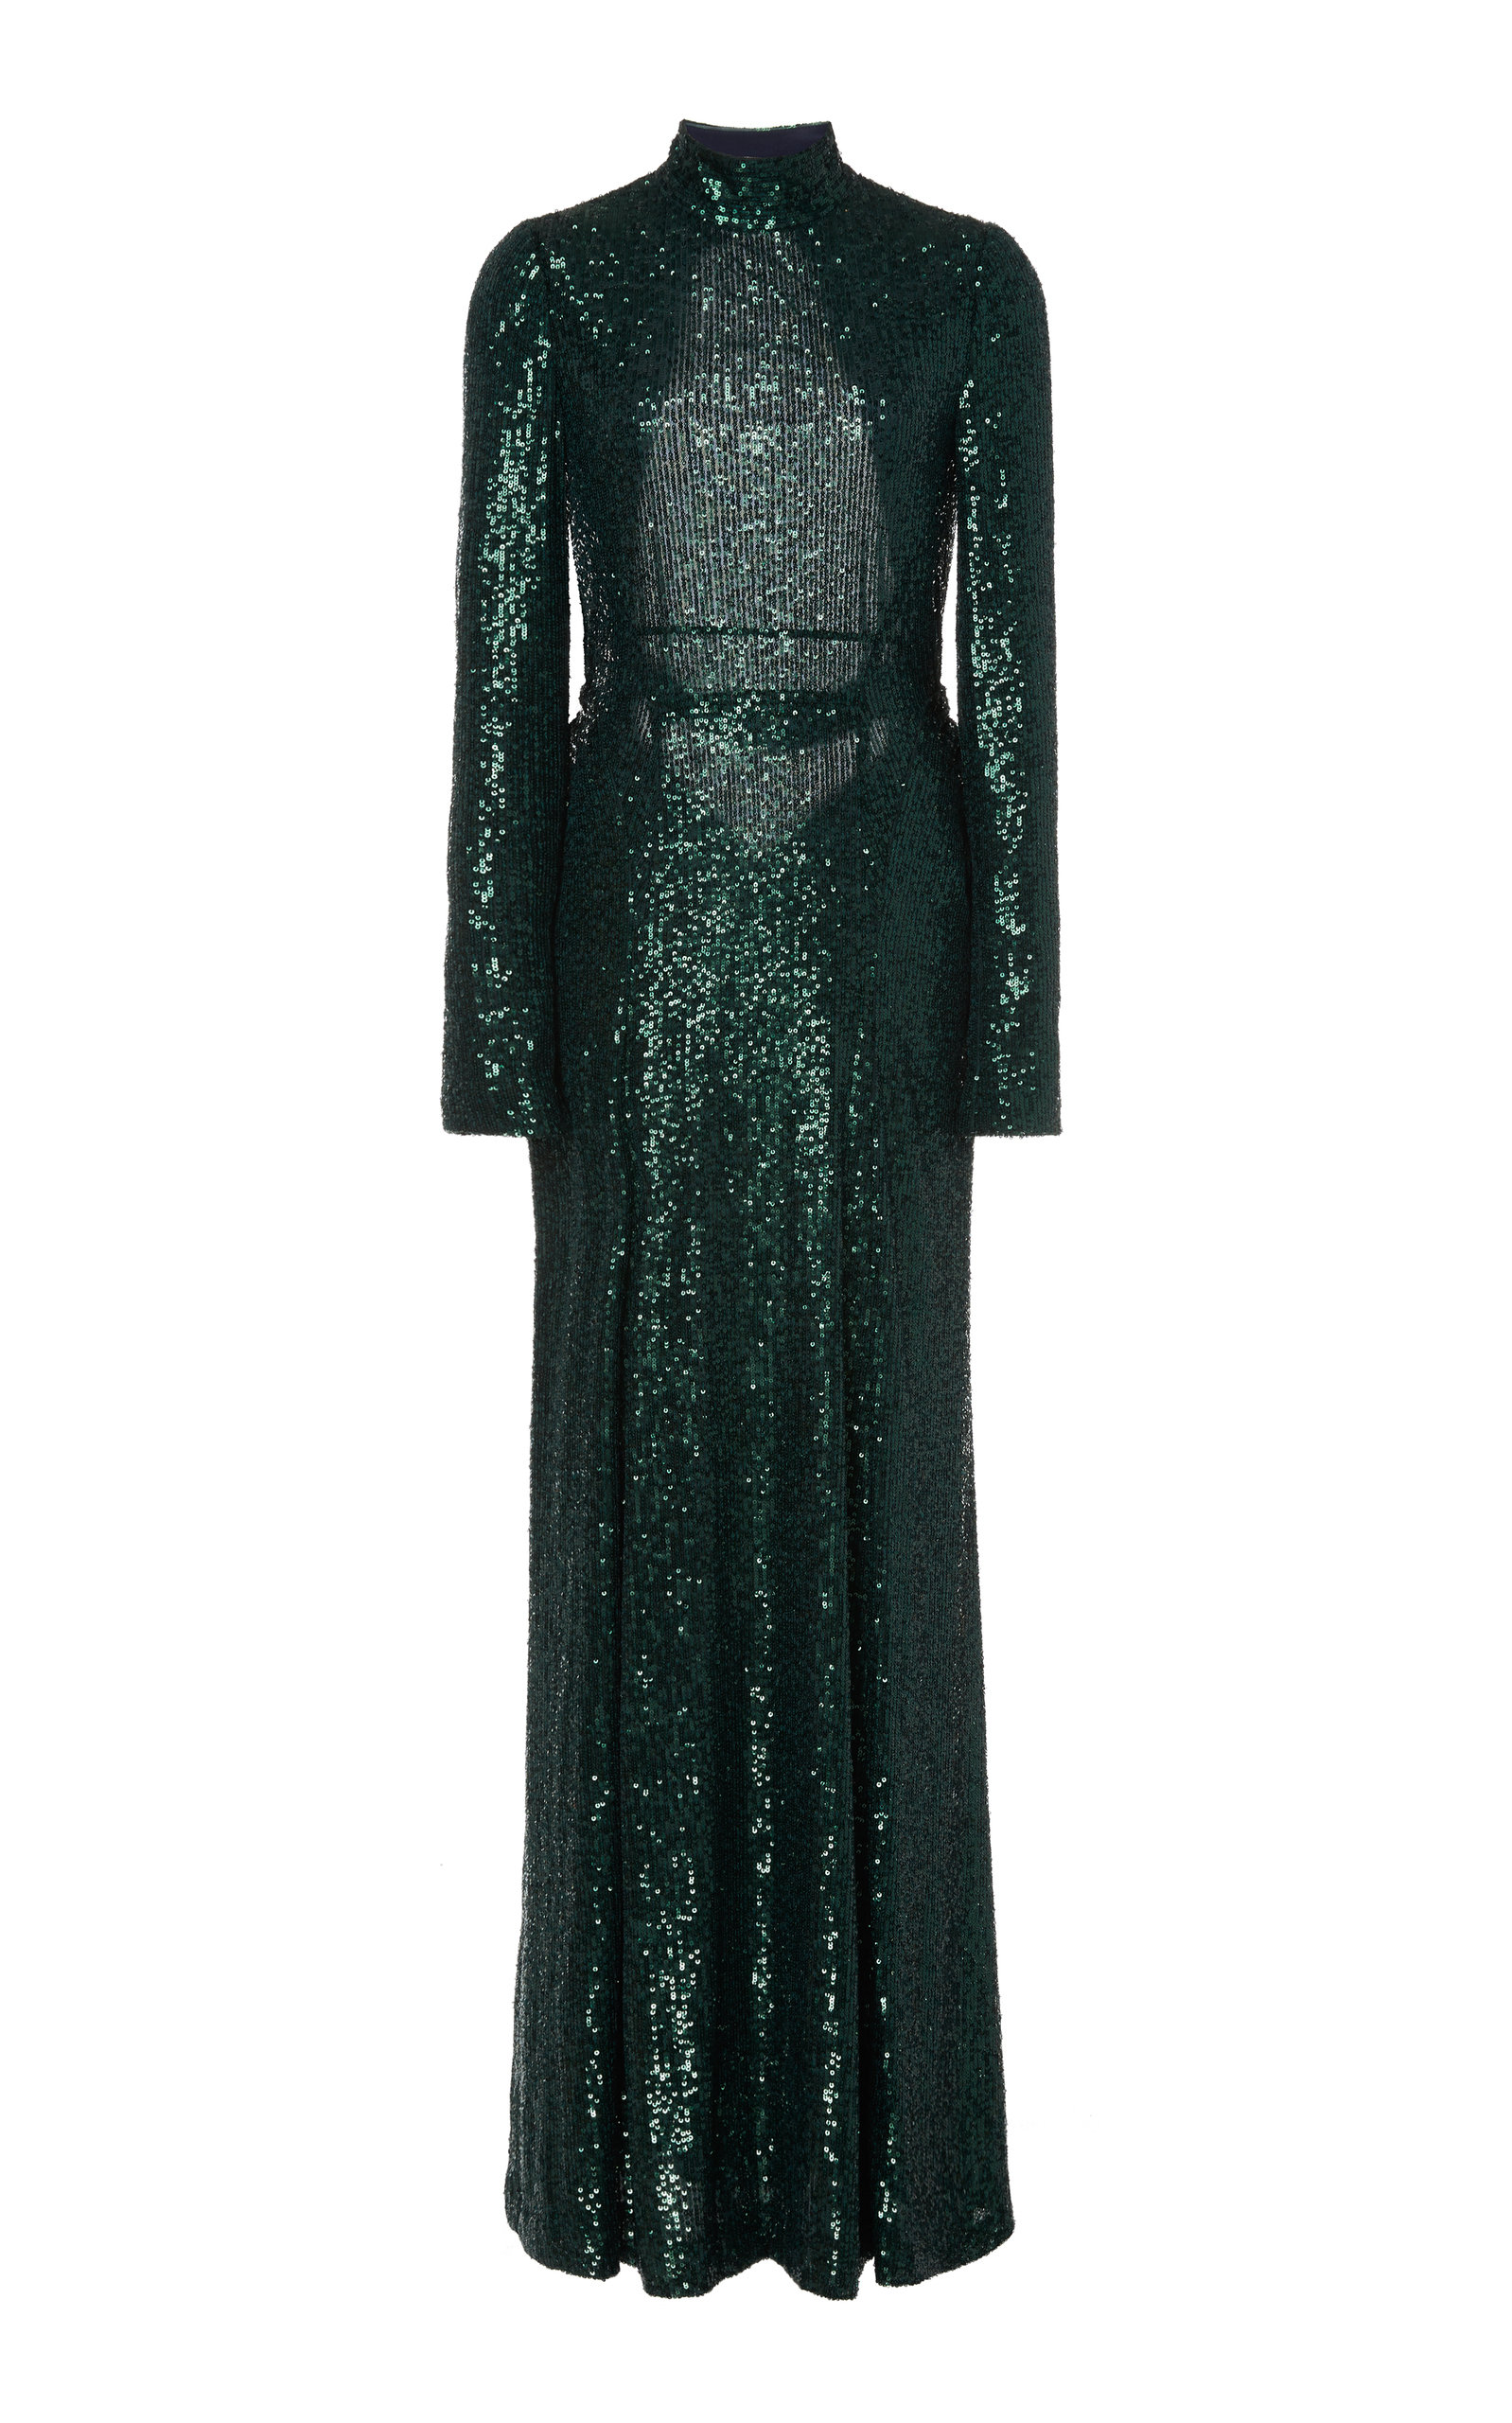 Buy Galvan Modern Love Sequin-Embellished Cady Backless Dress online, shop Galvan at the best price